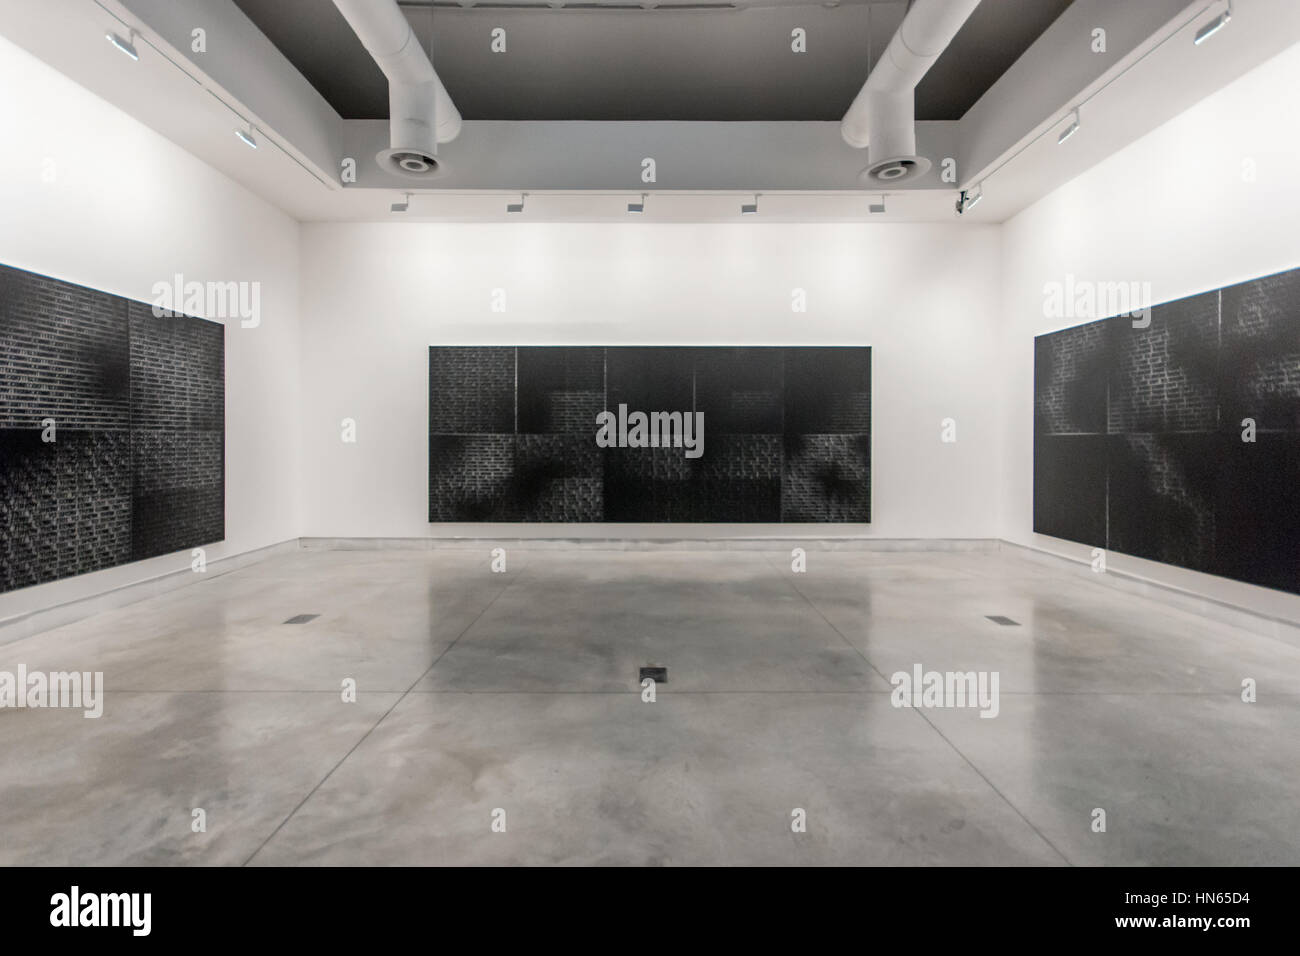 Glenn Ligon, Come Out painting series, 2015, silkscreen on canvas, Central Pavilion exhibition, 56th Venice Art - Stock Image